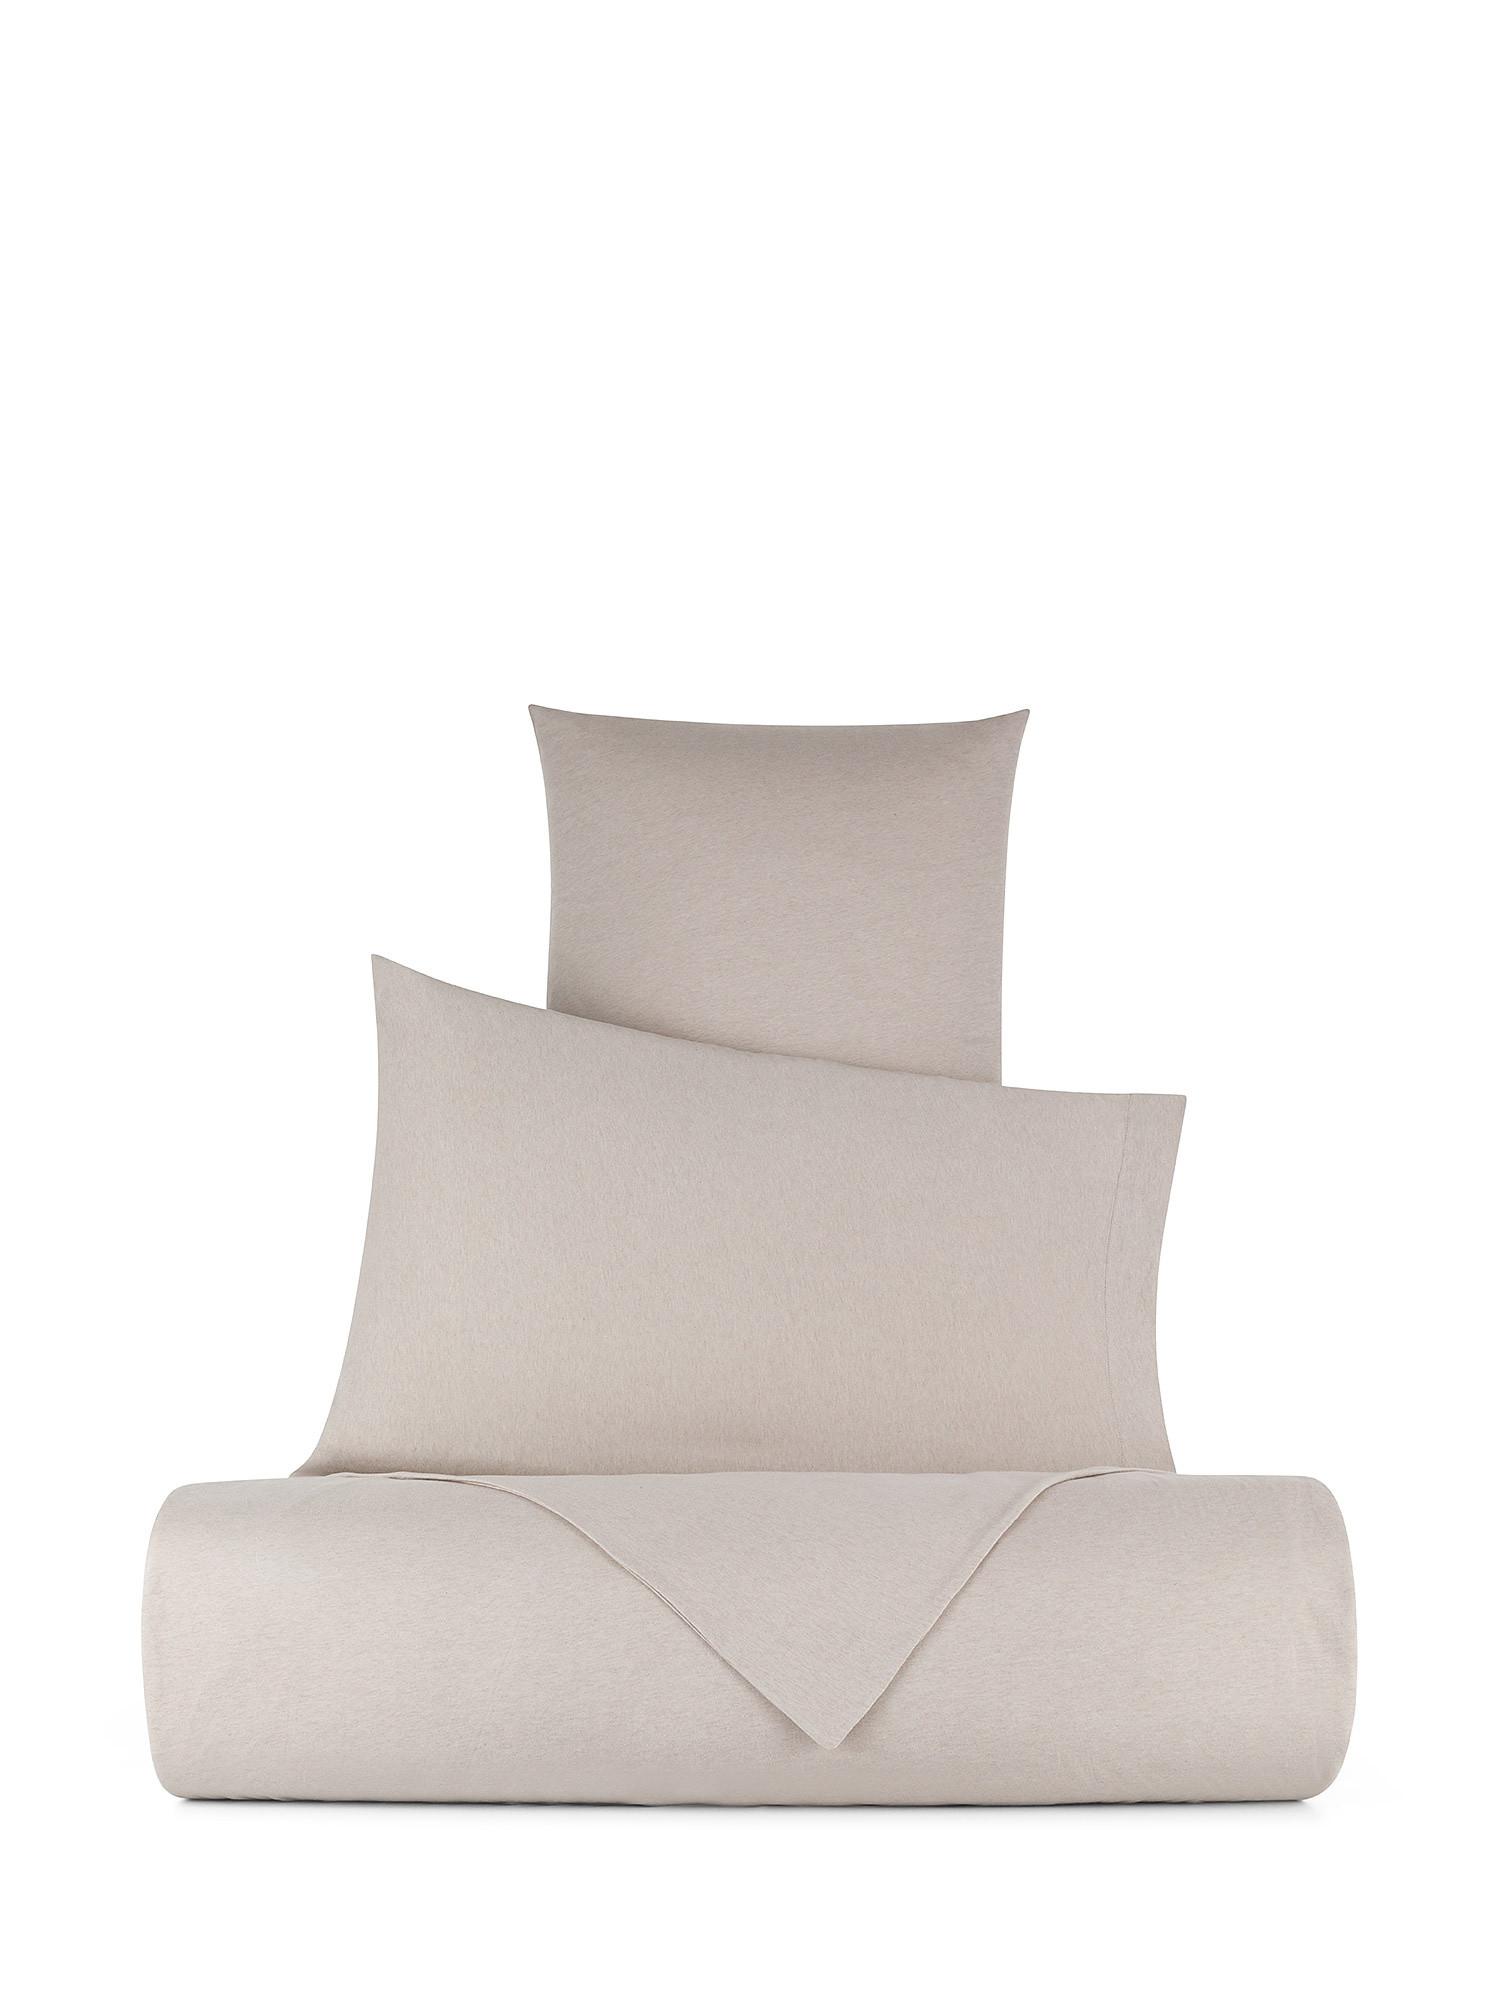 Parure copripiumino jersey di cotone tinta unita, Beige, large image number 0